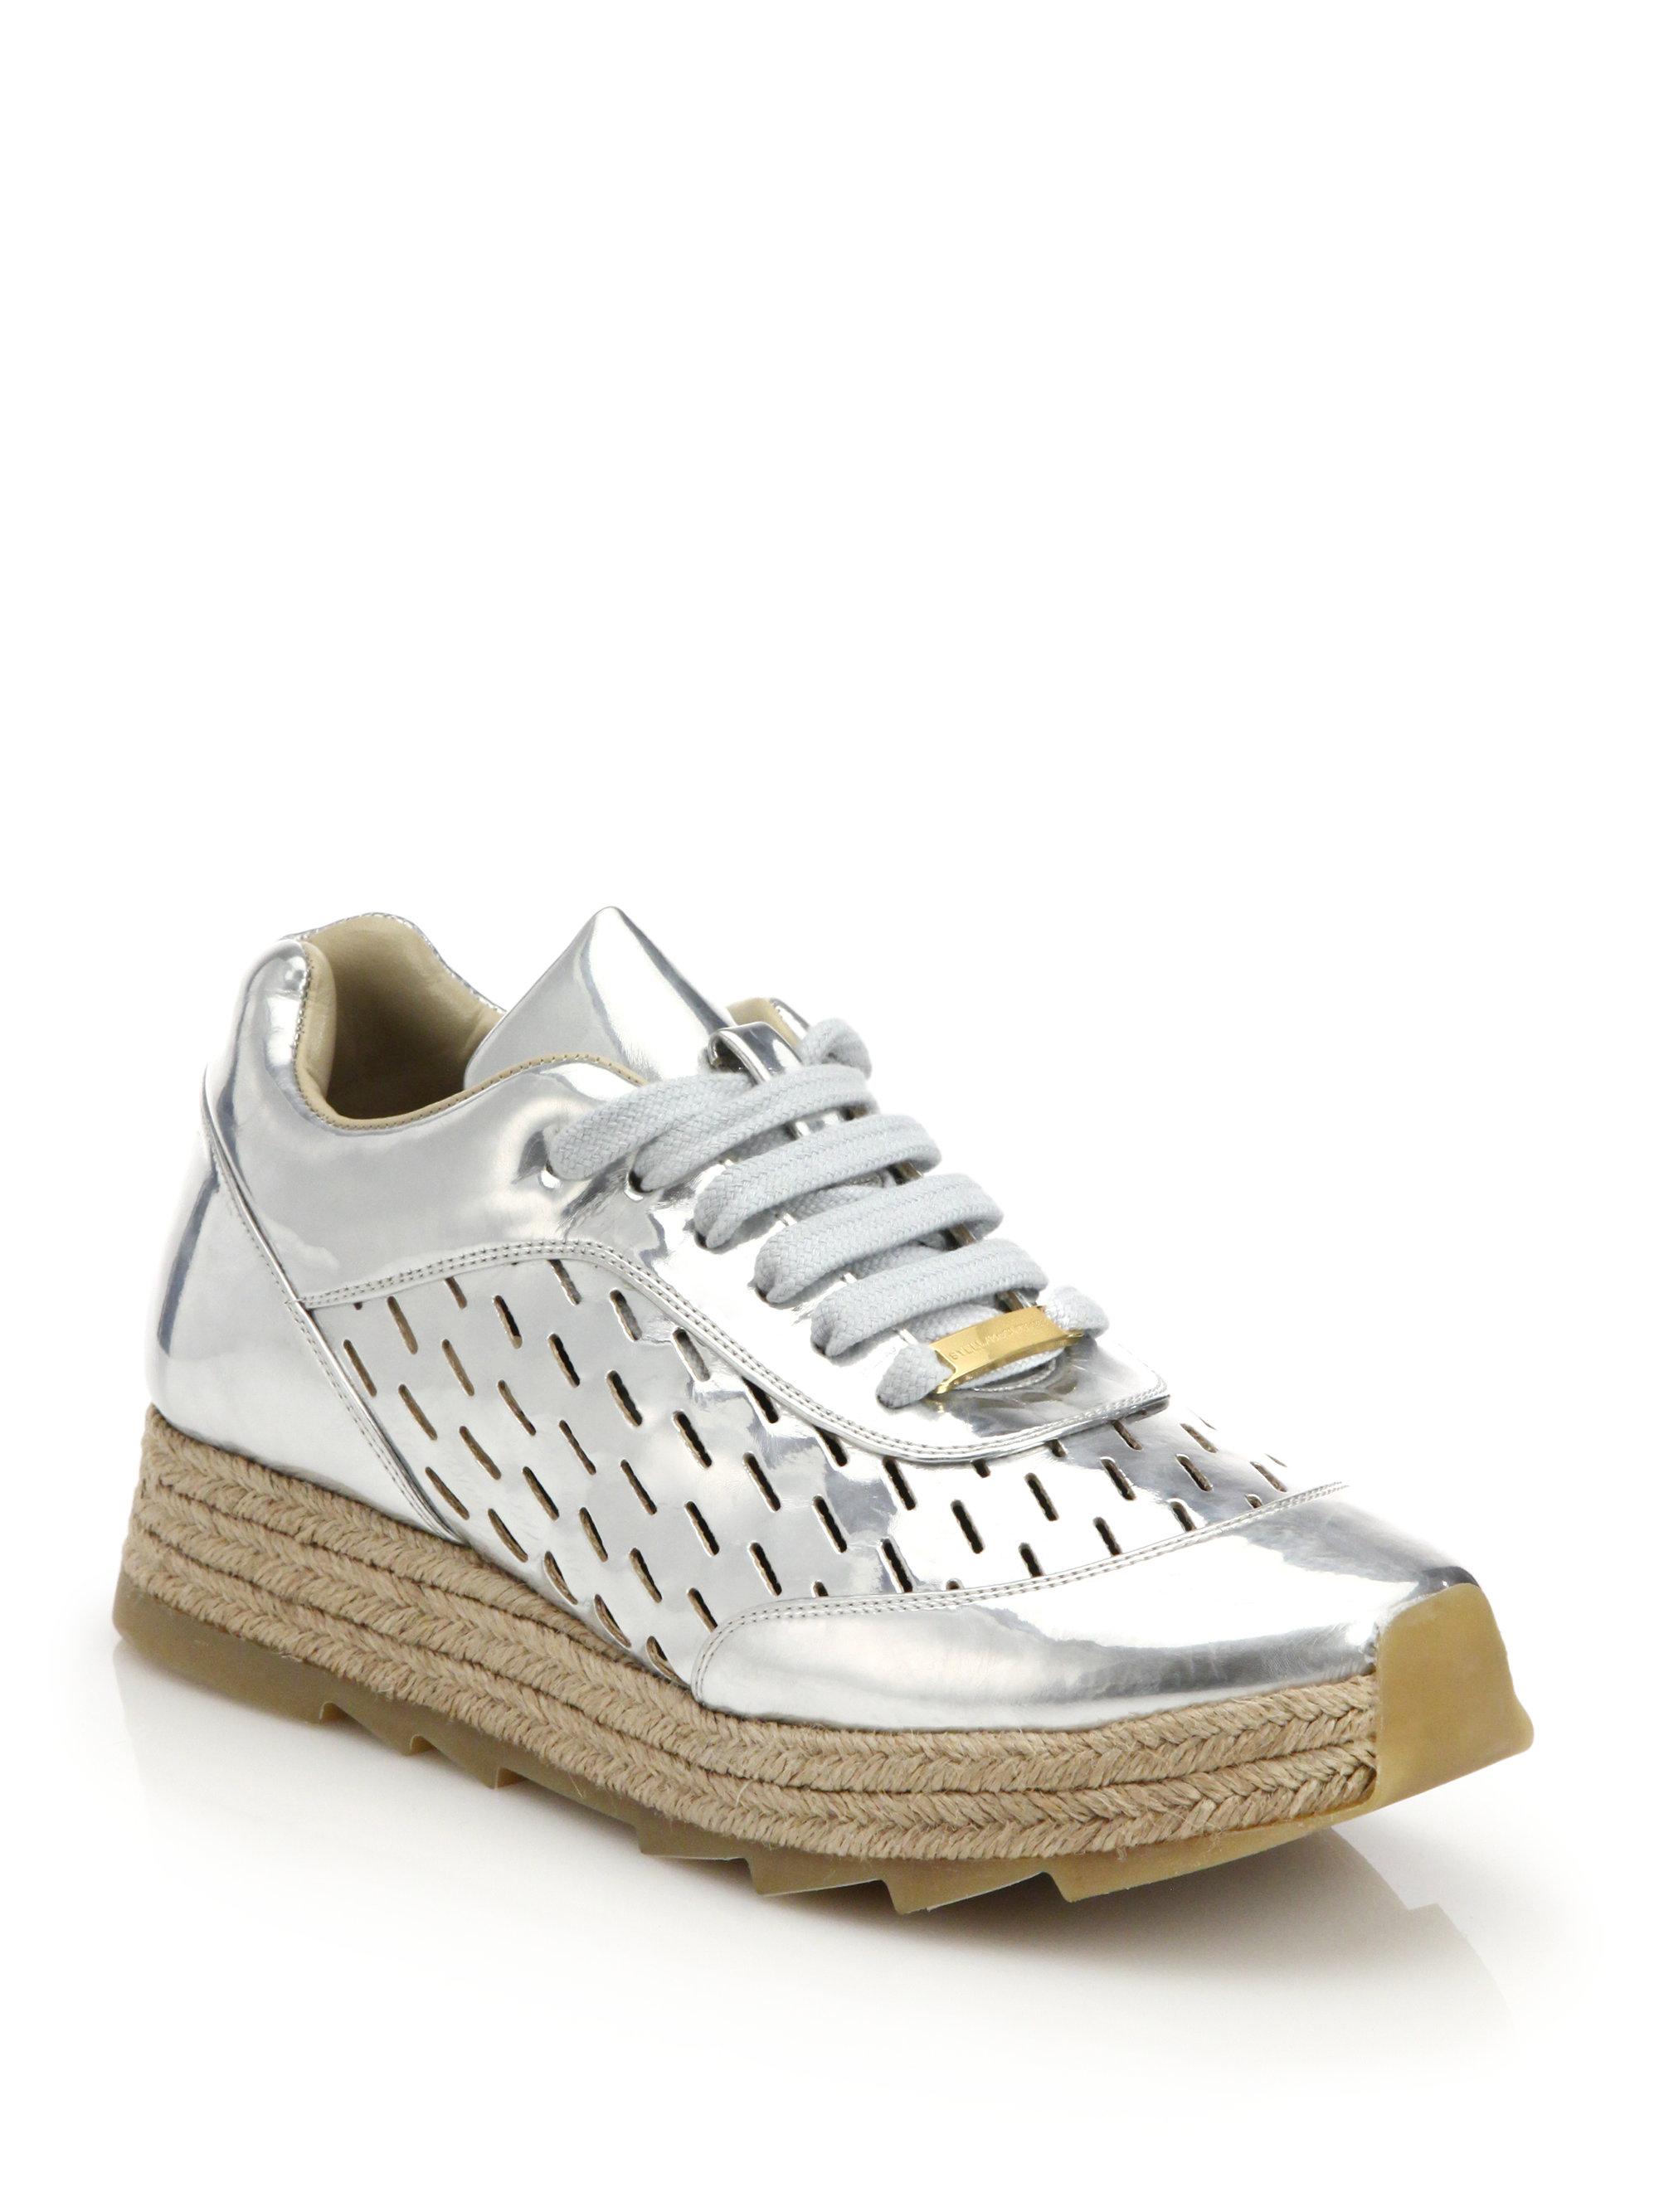 Argent Chaussures De Sport Stella - Stella Mccartney Métallique JQOe2e